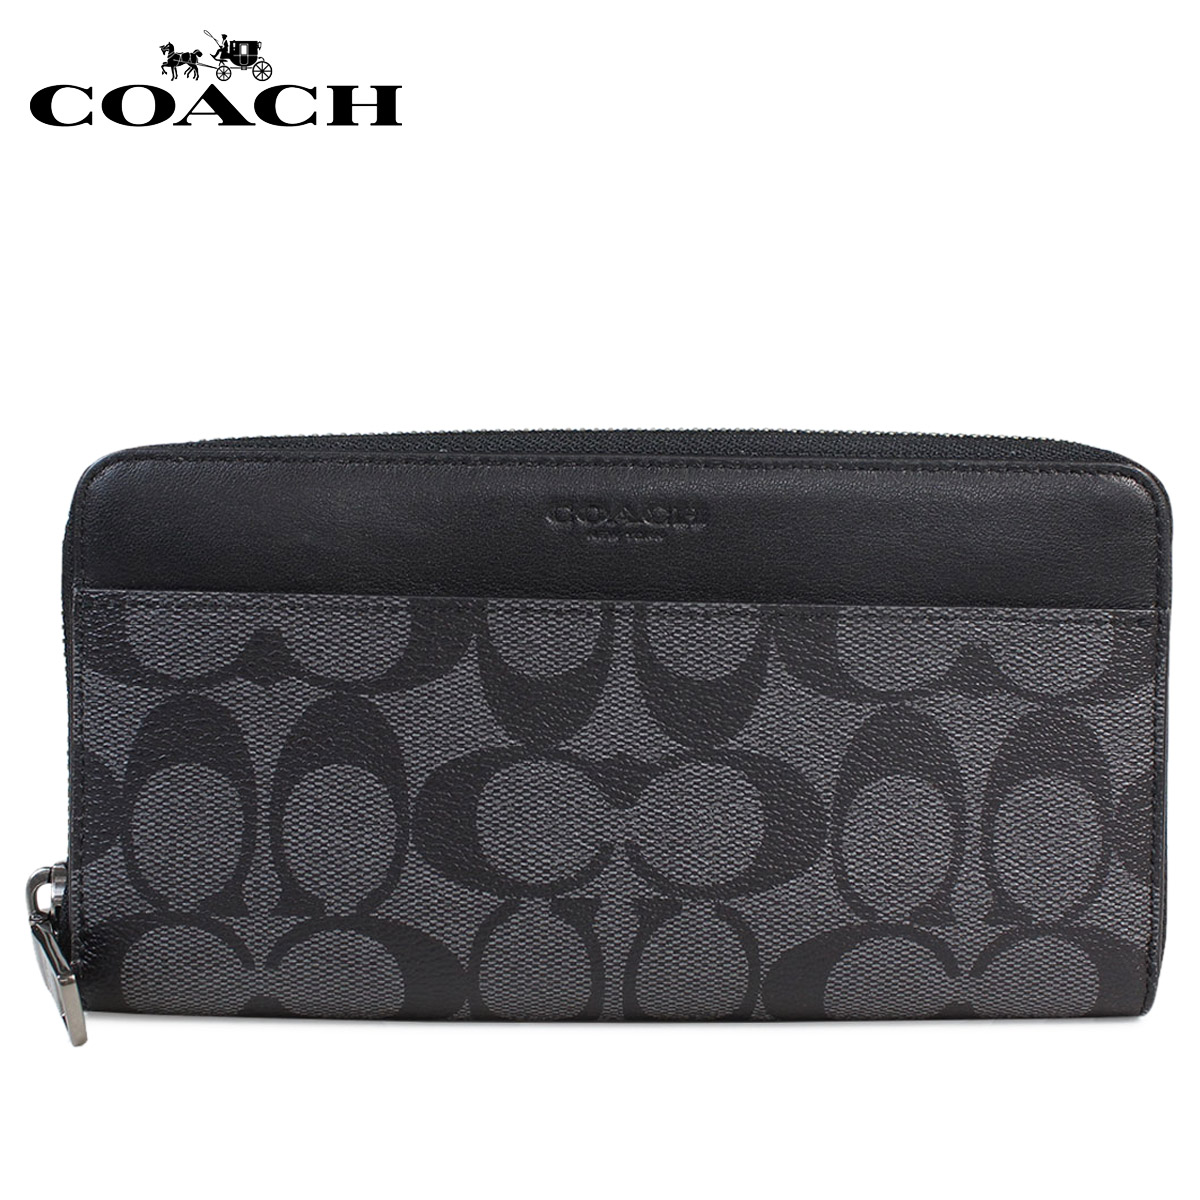 b2f9f16c6b COACH long wallet men coach wallet leather genuine leather F58112 CQBK  charcoal X black black